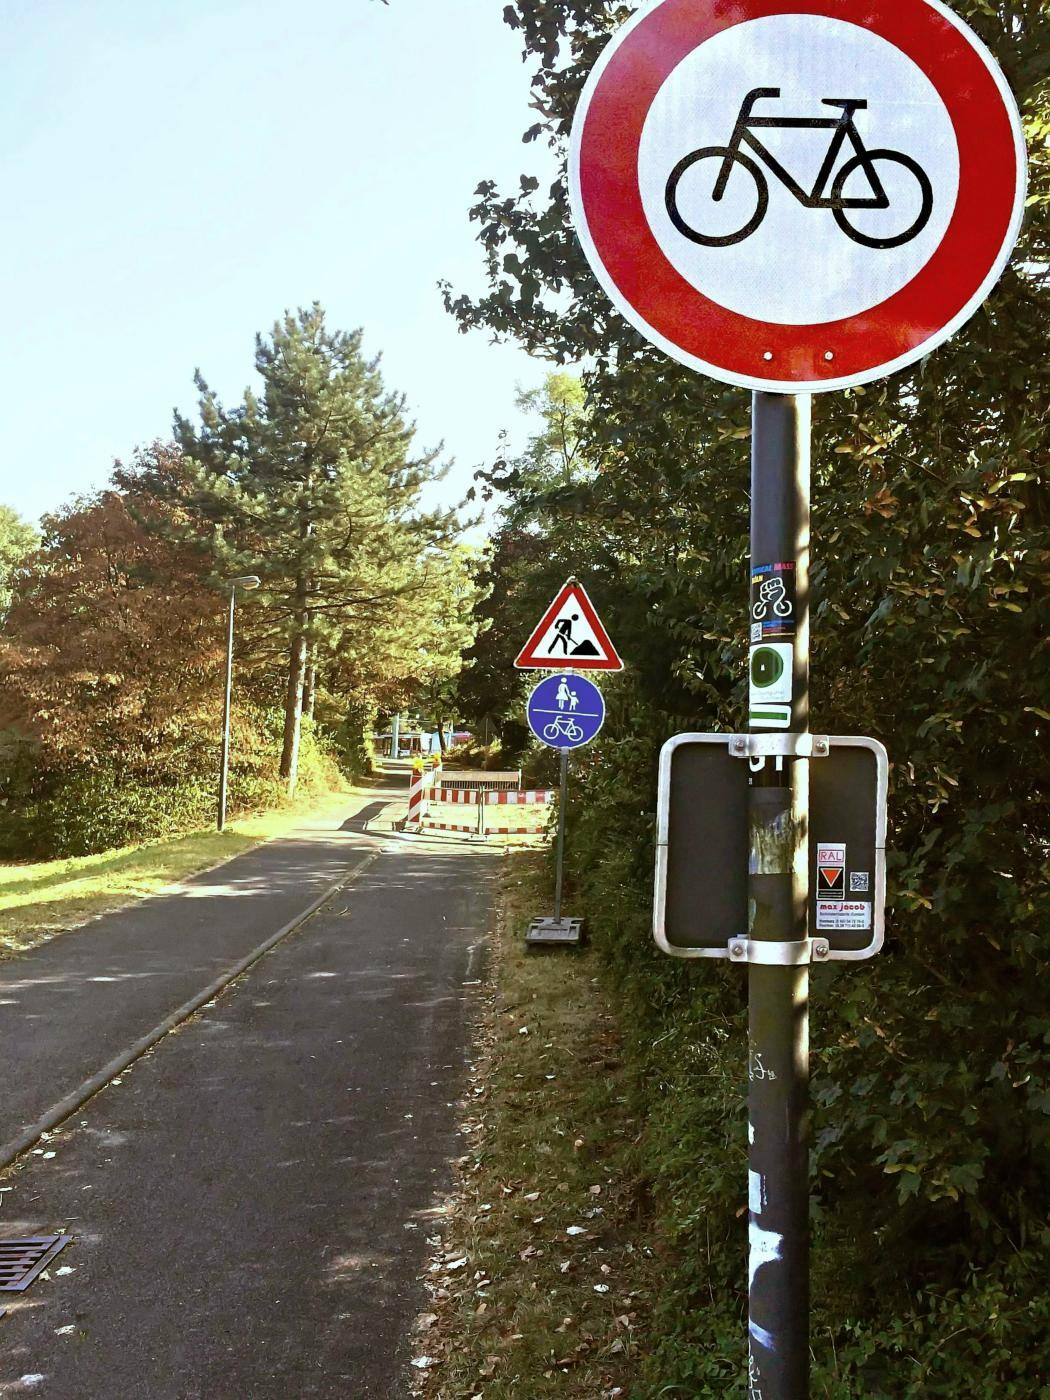 Radweg mit Radfahrverbot